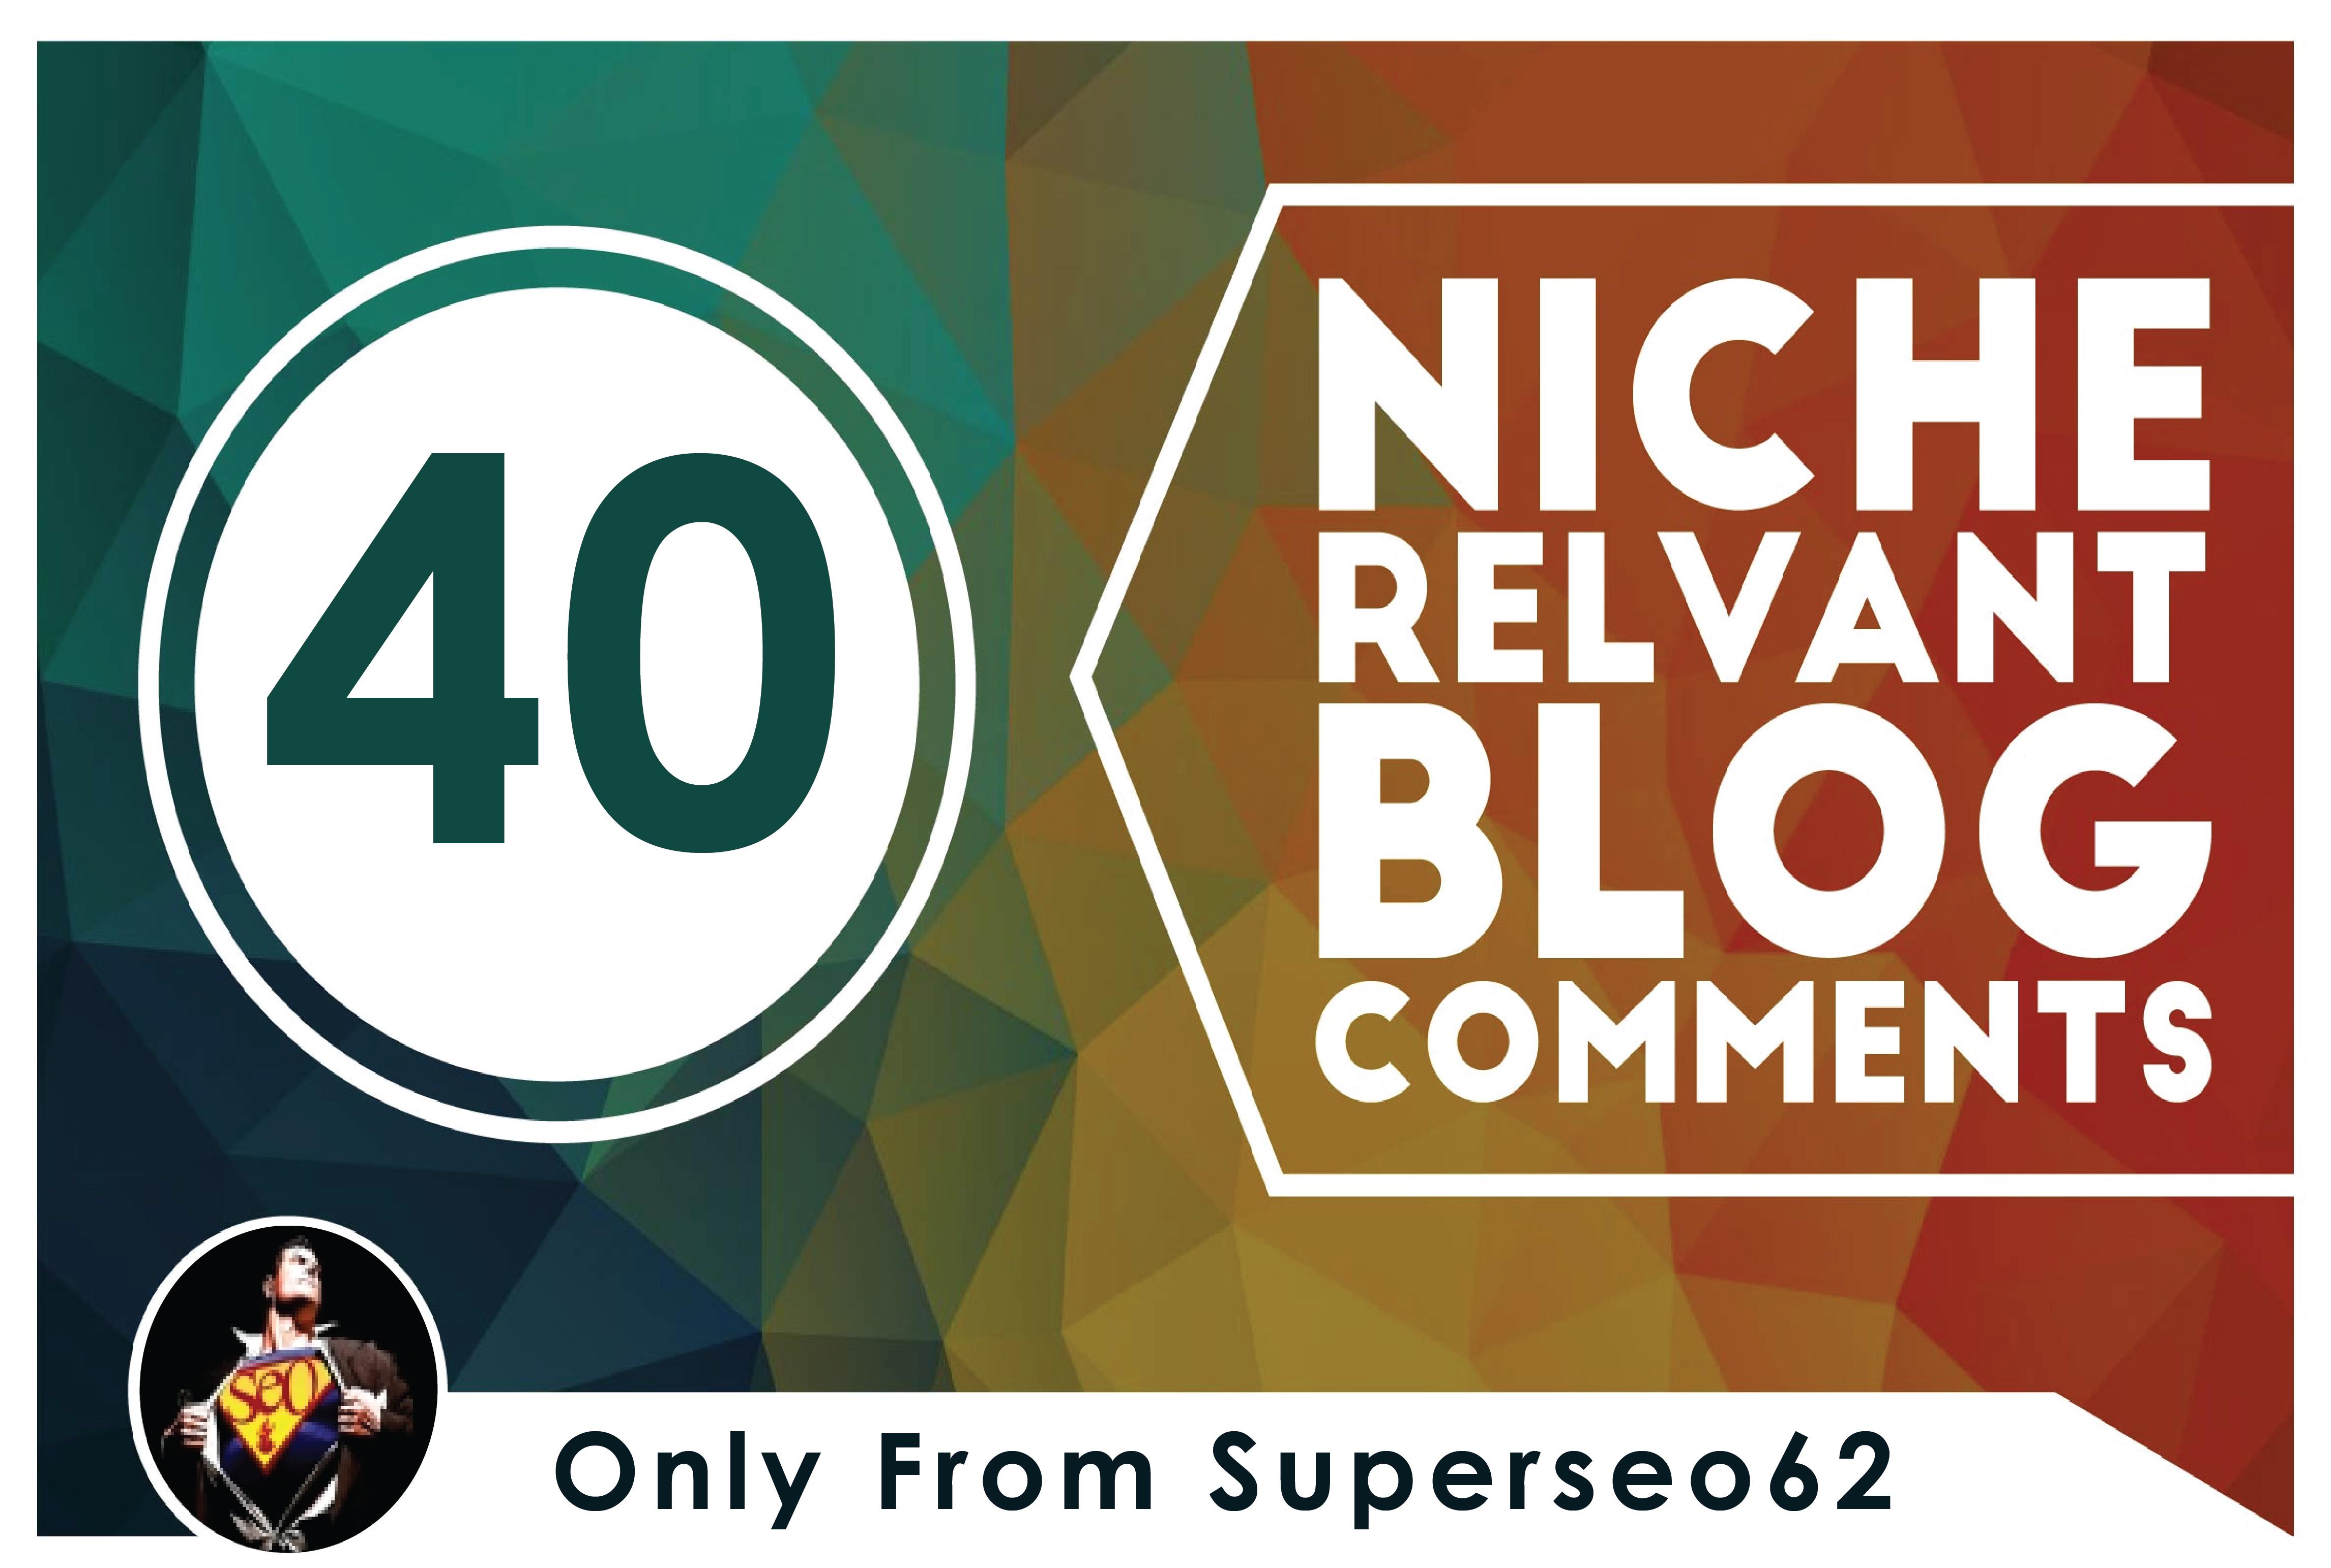 Provide 40 Niche Relevant Blog Comment Backlinks Low Obl